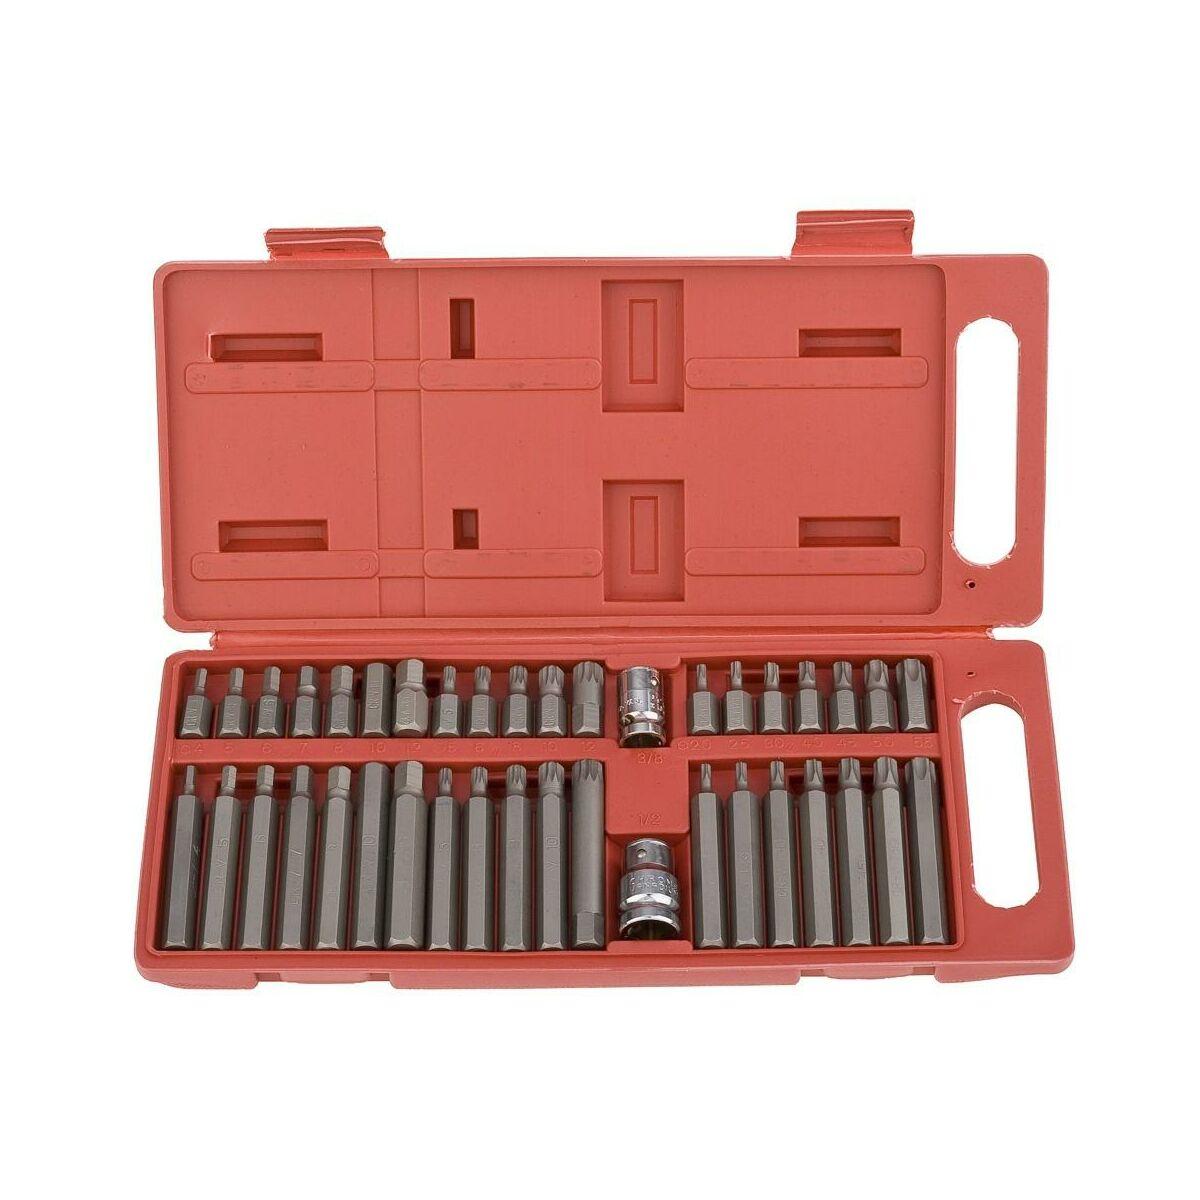 Zestaw Bitów 39d377 40 Szt Top Tools